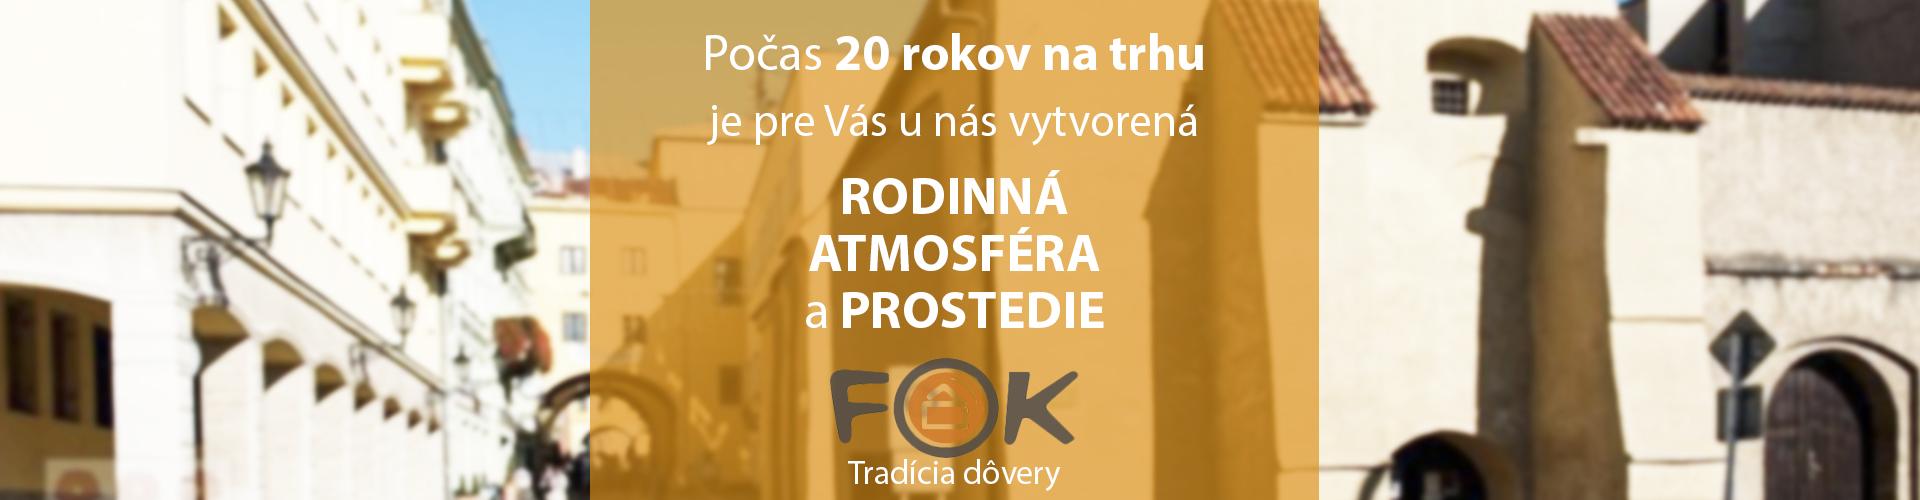 FOK_Reality4